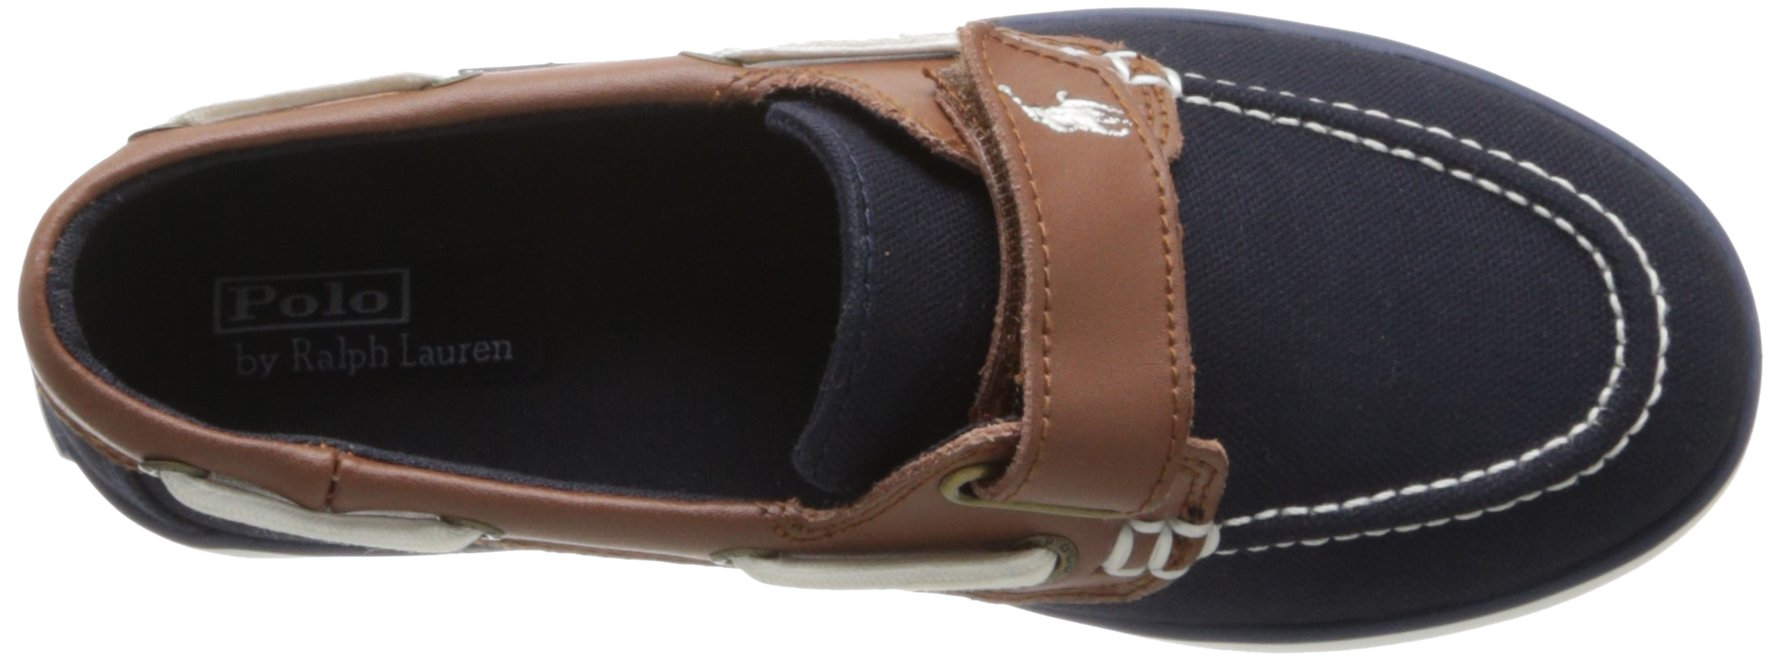 Polo Ralph Lauren Kids Sander-CL EZ Sneaker ,Navy,10.5 M US Little Kid by Polo Ralph Lauren (Image #7)